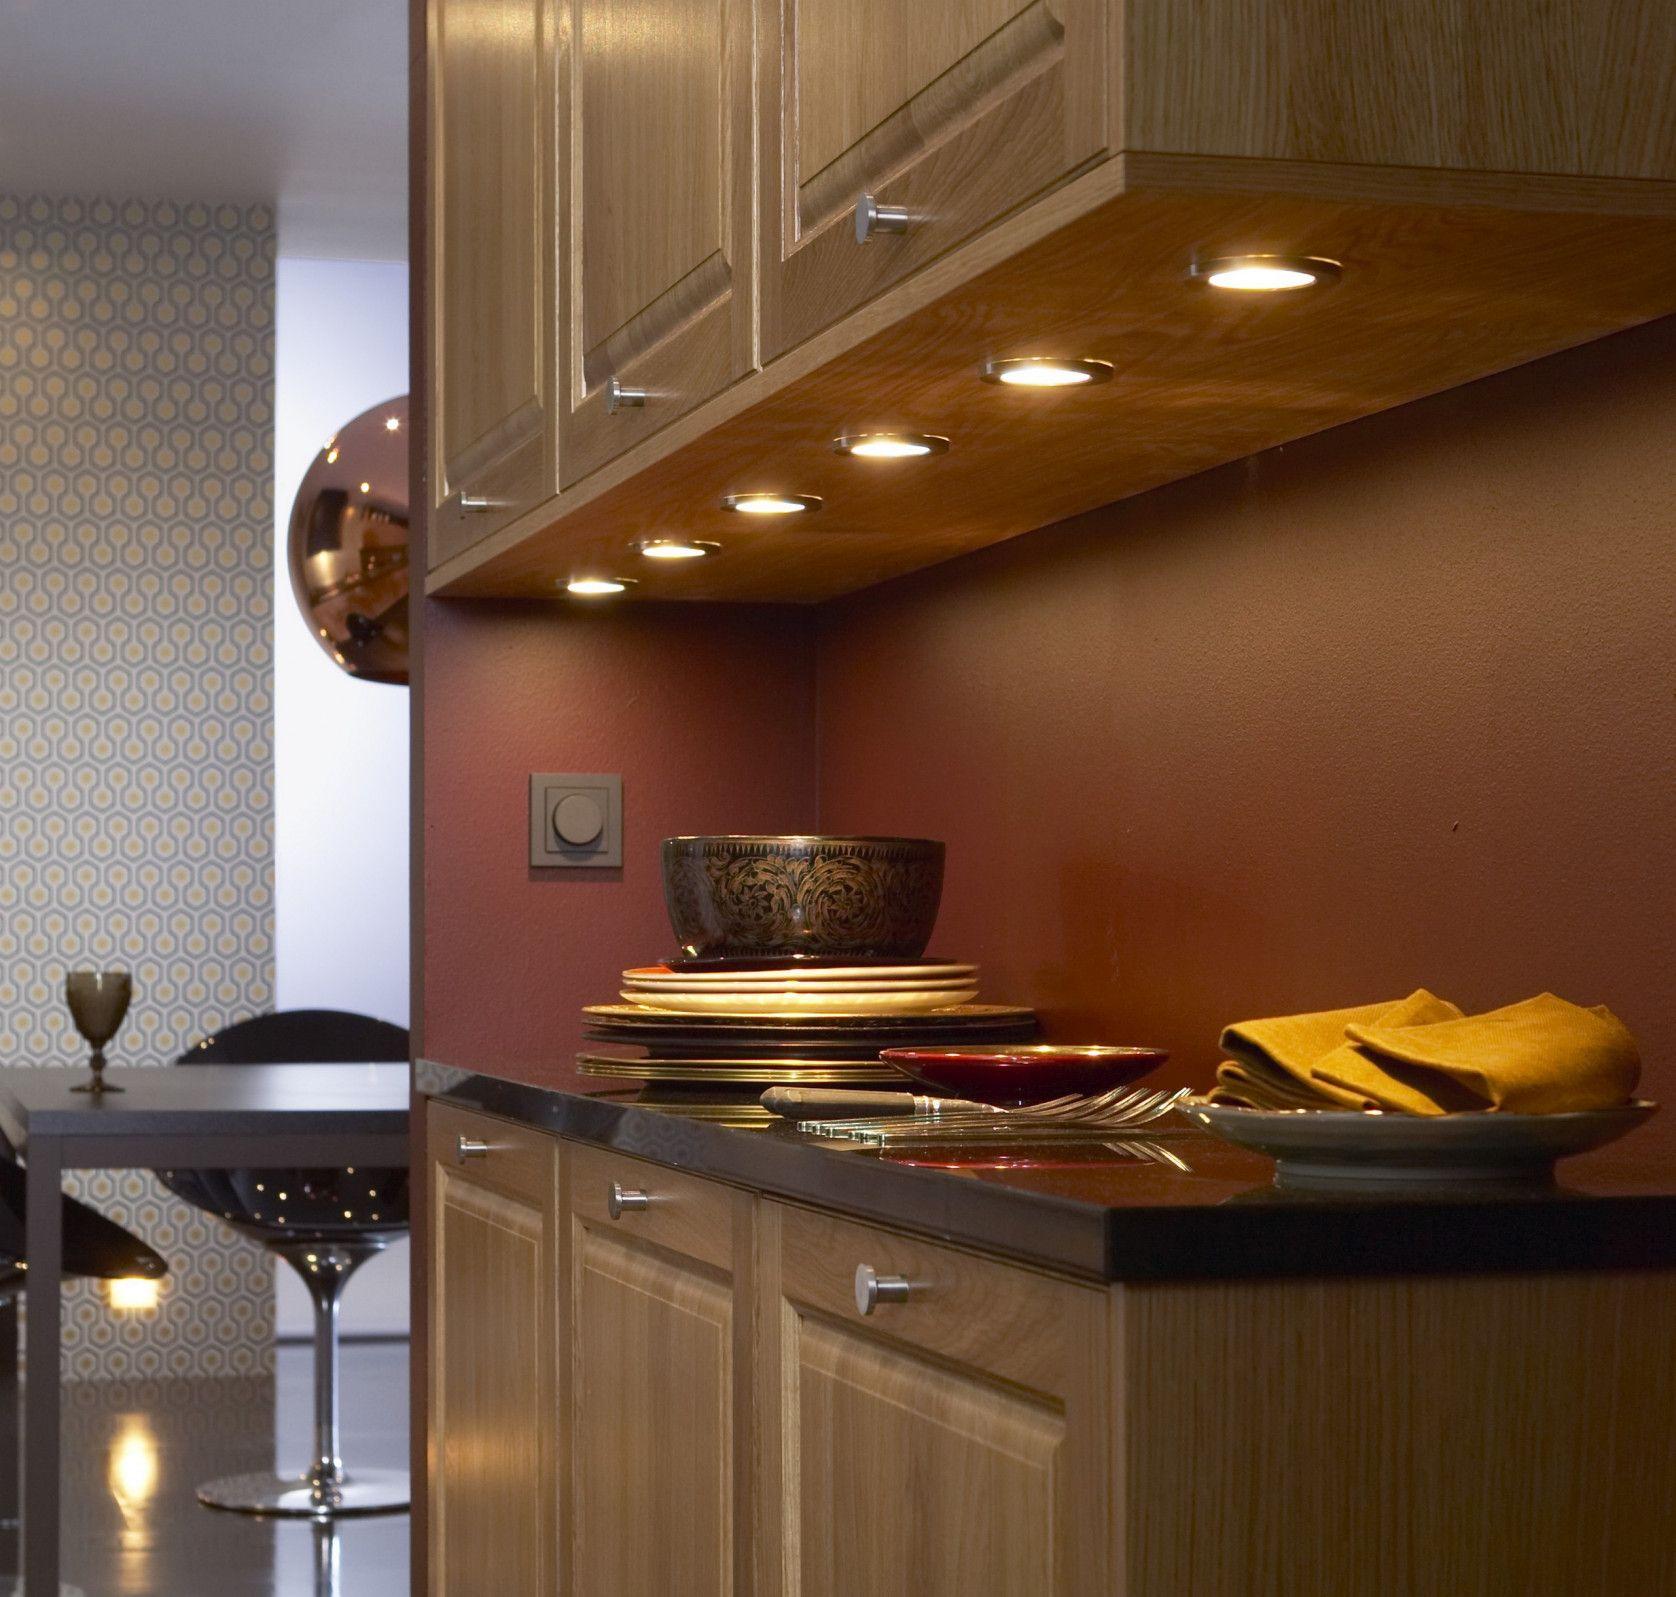 Pin By Rahayu12 On Interior Analogi Kitchen Under Cabinet Lighting